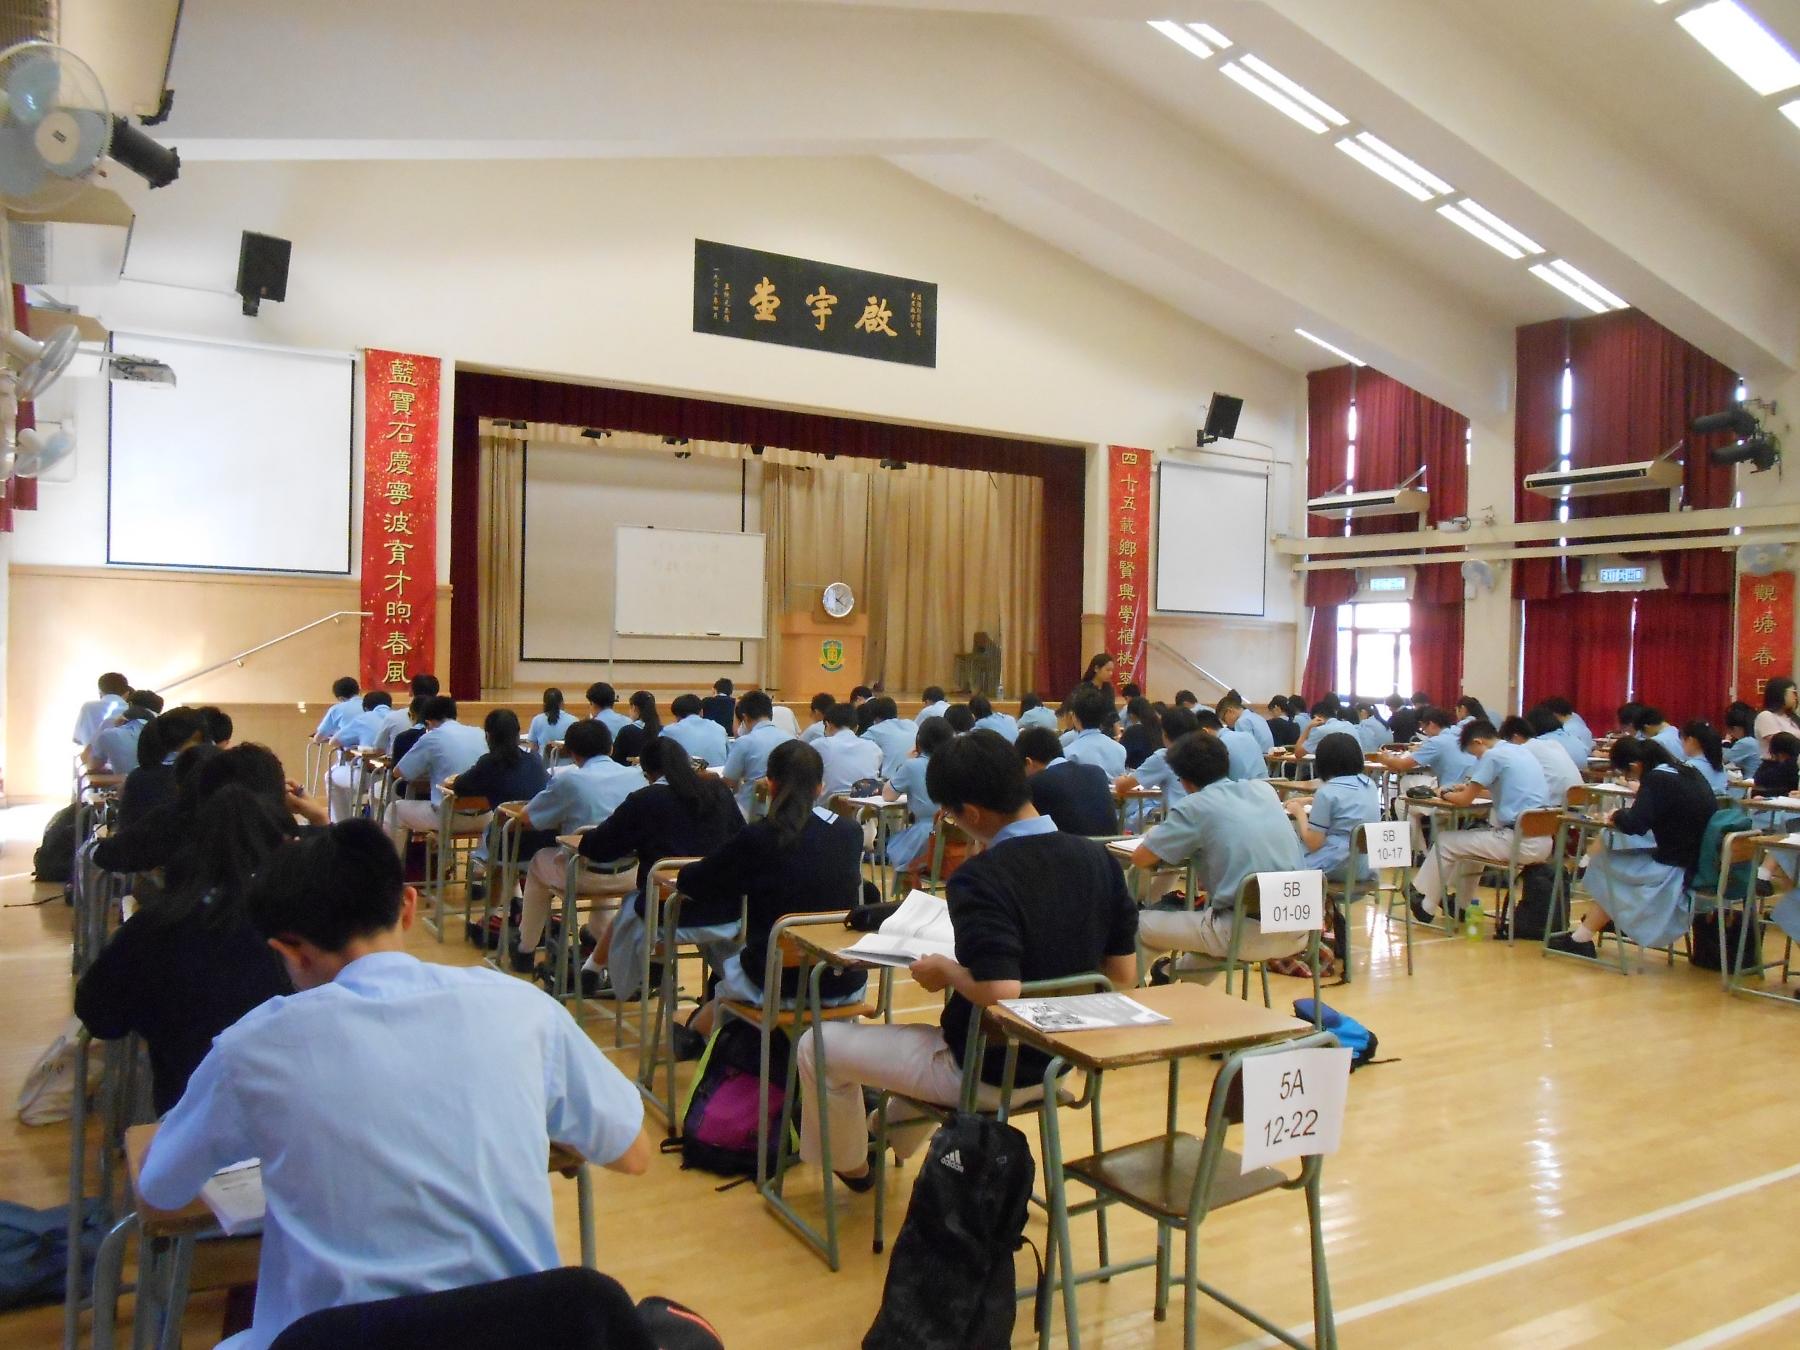 http://npc.edu.hk/sites/default/files/dscn0205.jpg